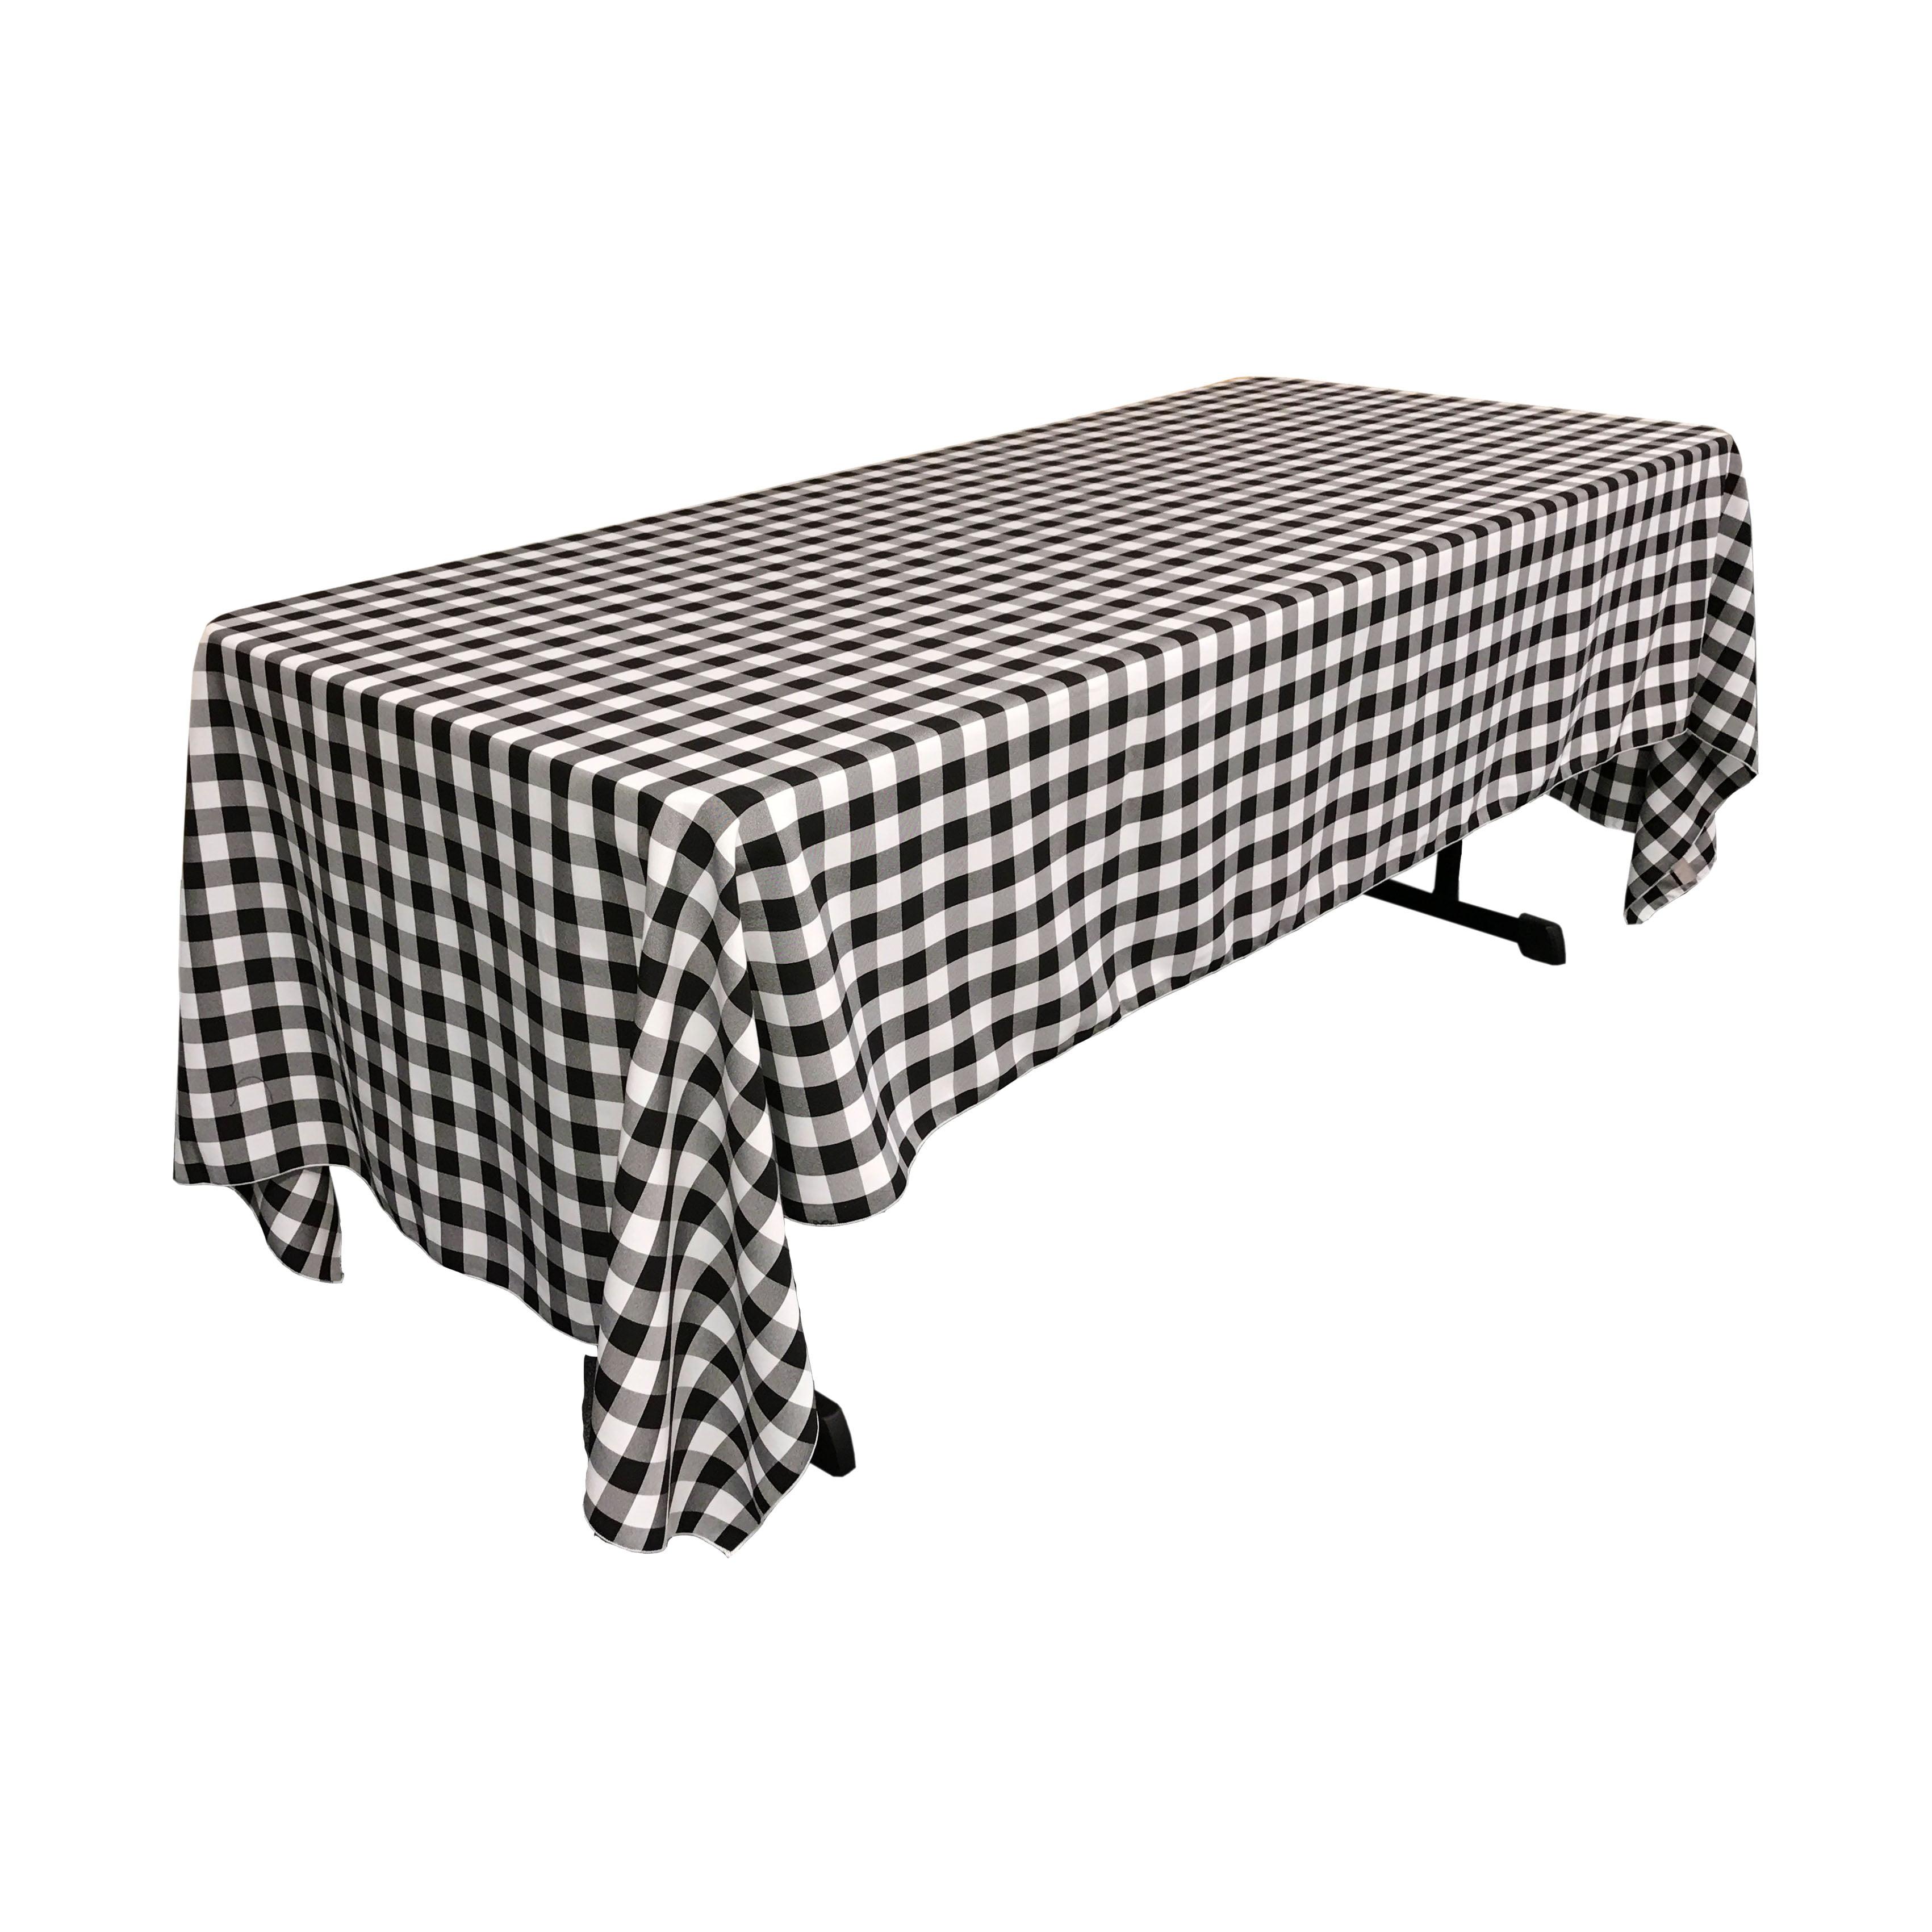 La Linen Polyester Gingham Checkered 60 By 120 Inch Rectangular Tablecloth White And Fuchsia Walmart Com Walmart Com